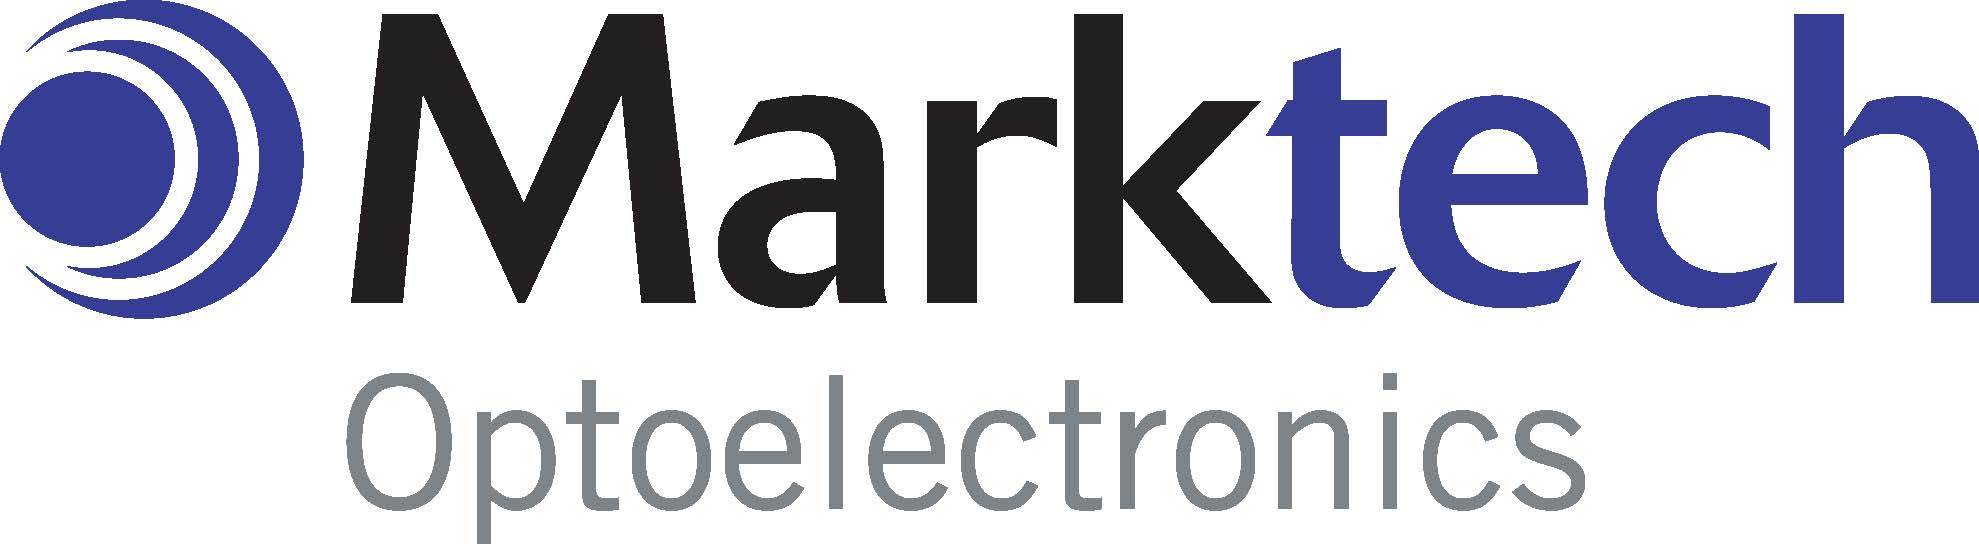 Marktech Optoelectronics Announces 5G R&D Breakthrough